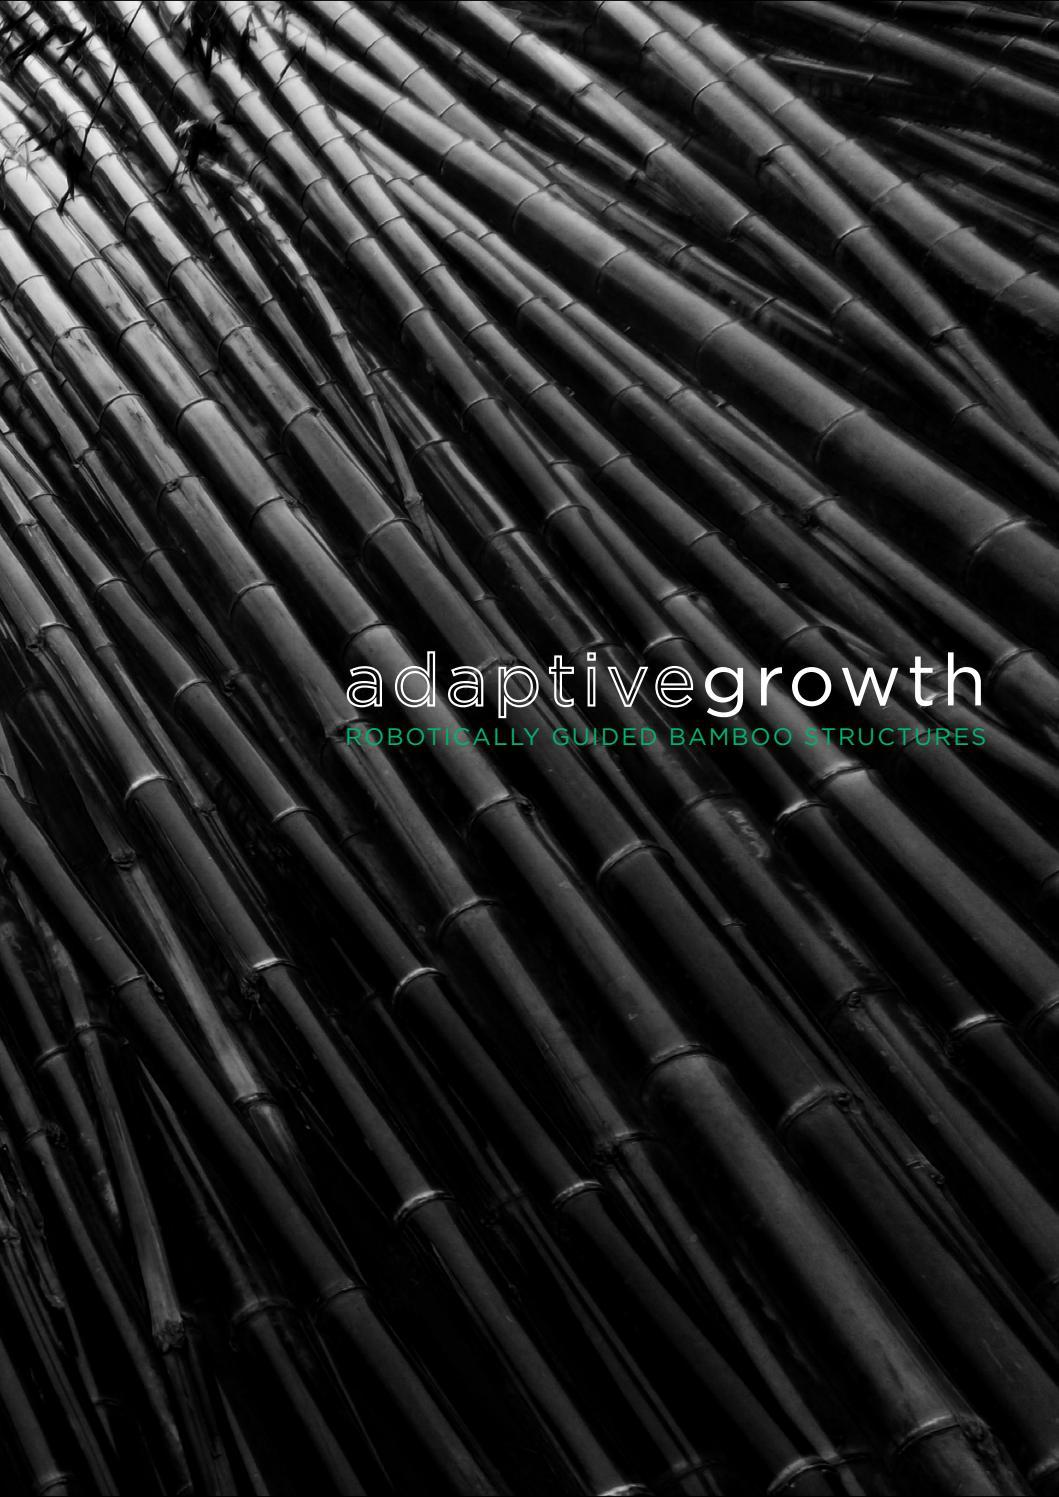 la bamboo stuttgart